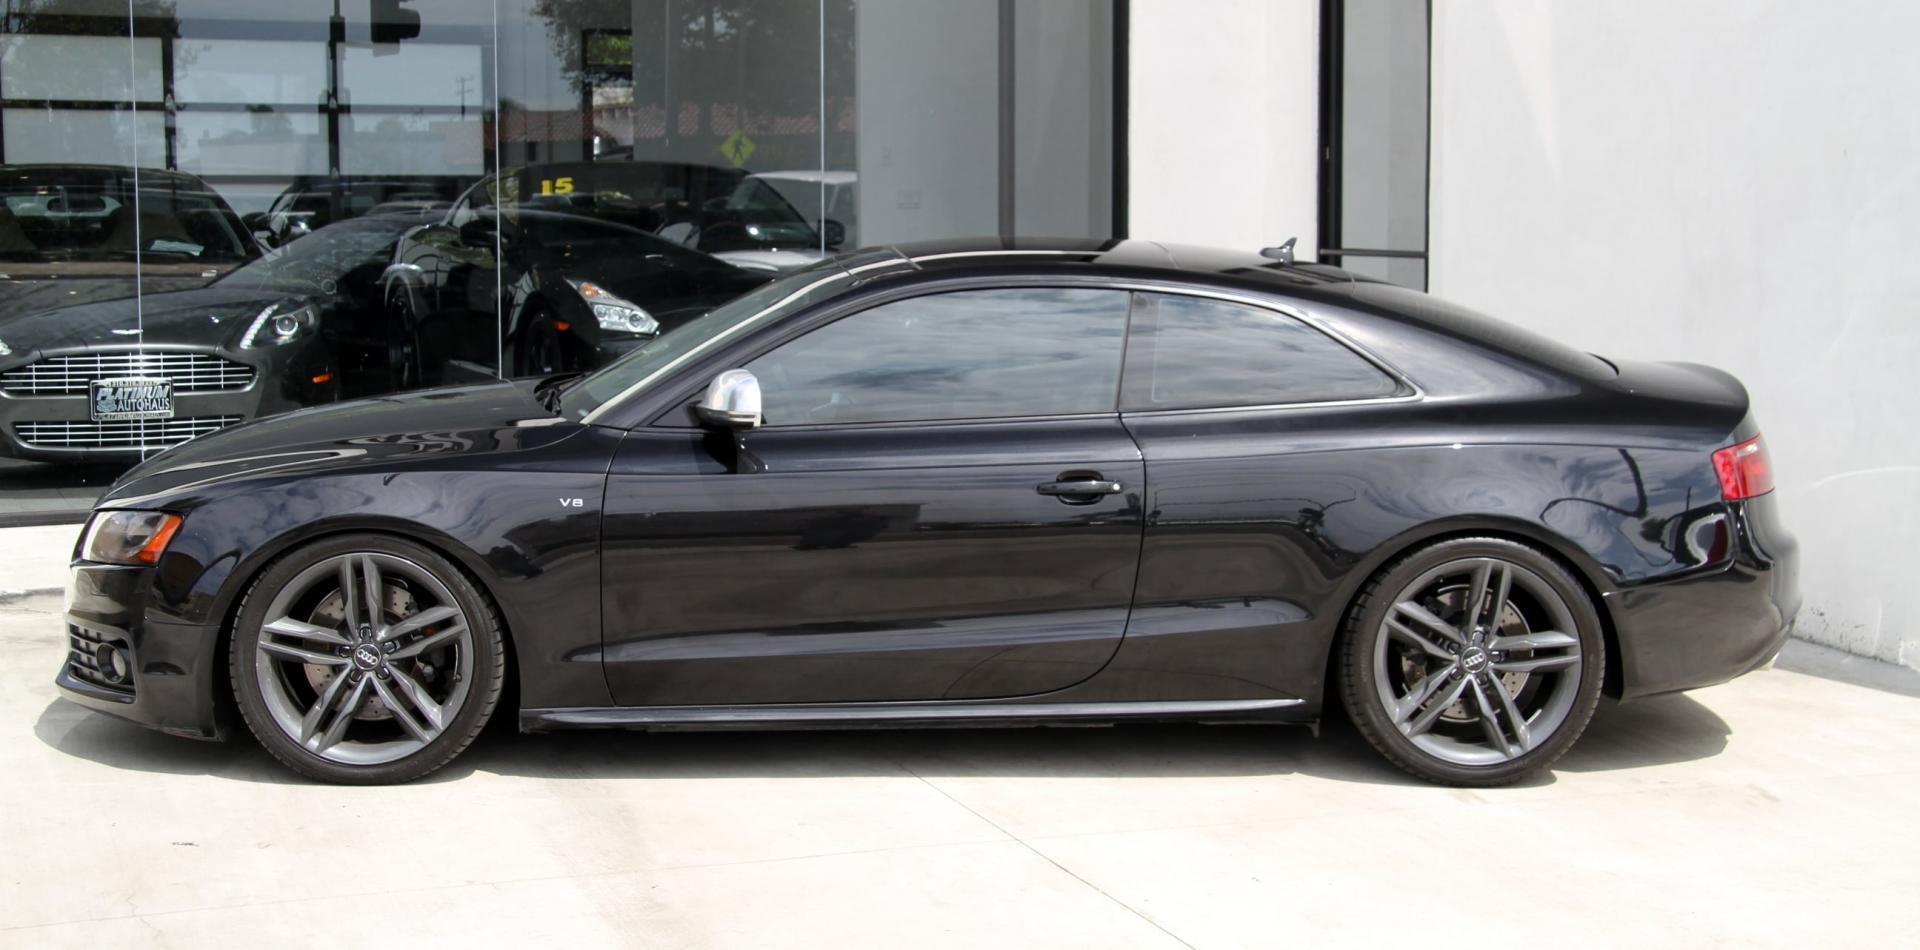 2009 Audi S5 4 2l Stock 5910c For Sale Near Redondo